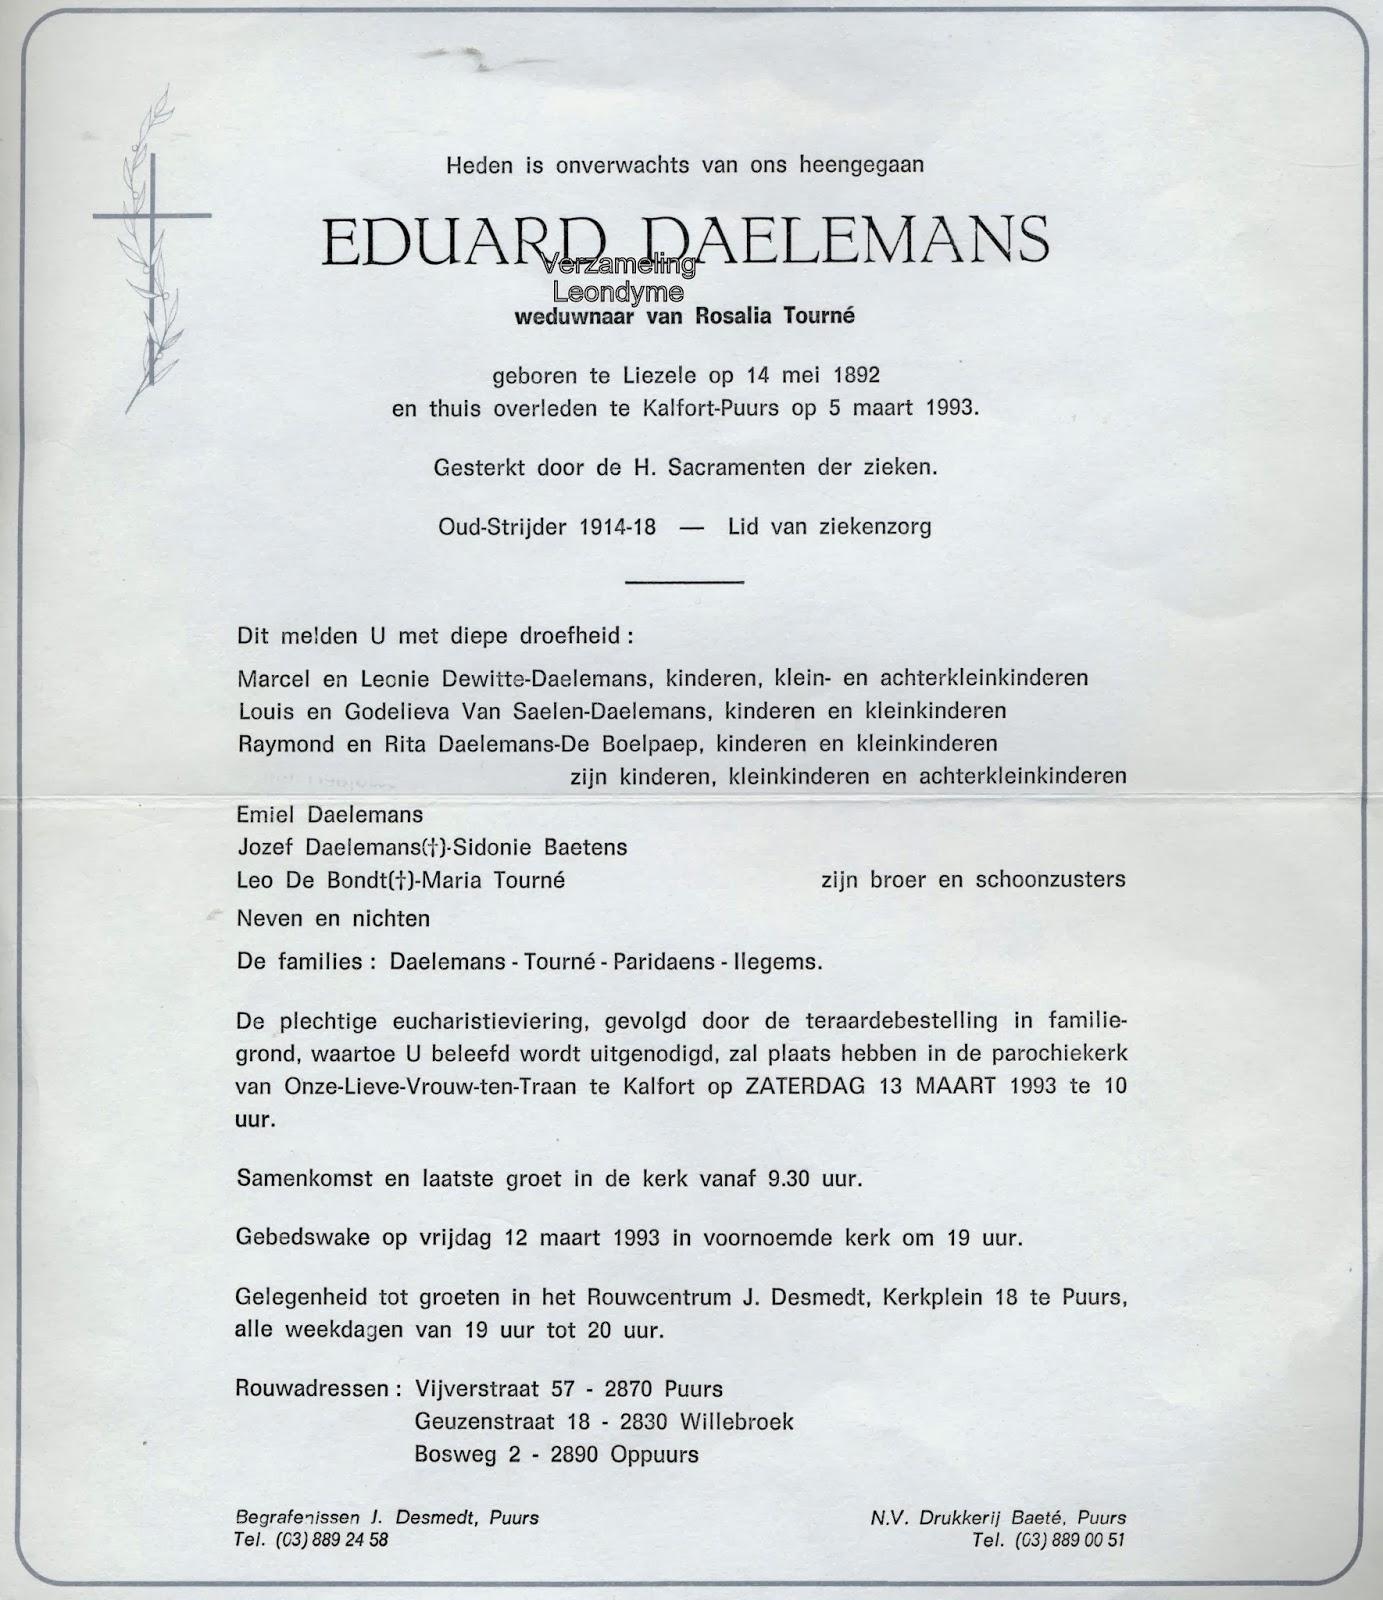 Rouwbrief, Eduard Daelemans. Verzameling Leondyme.